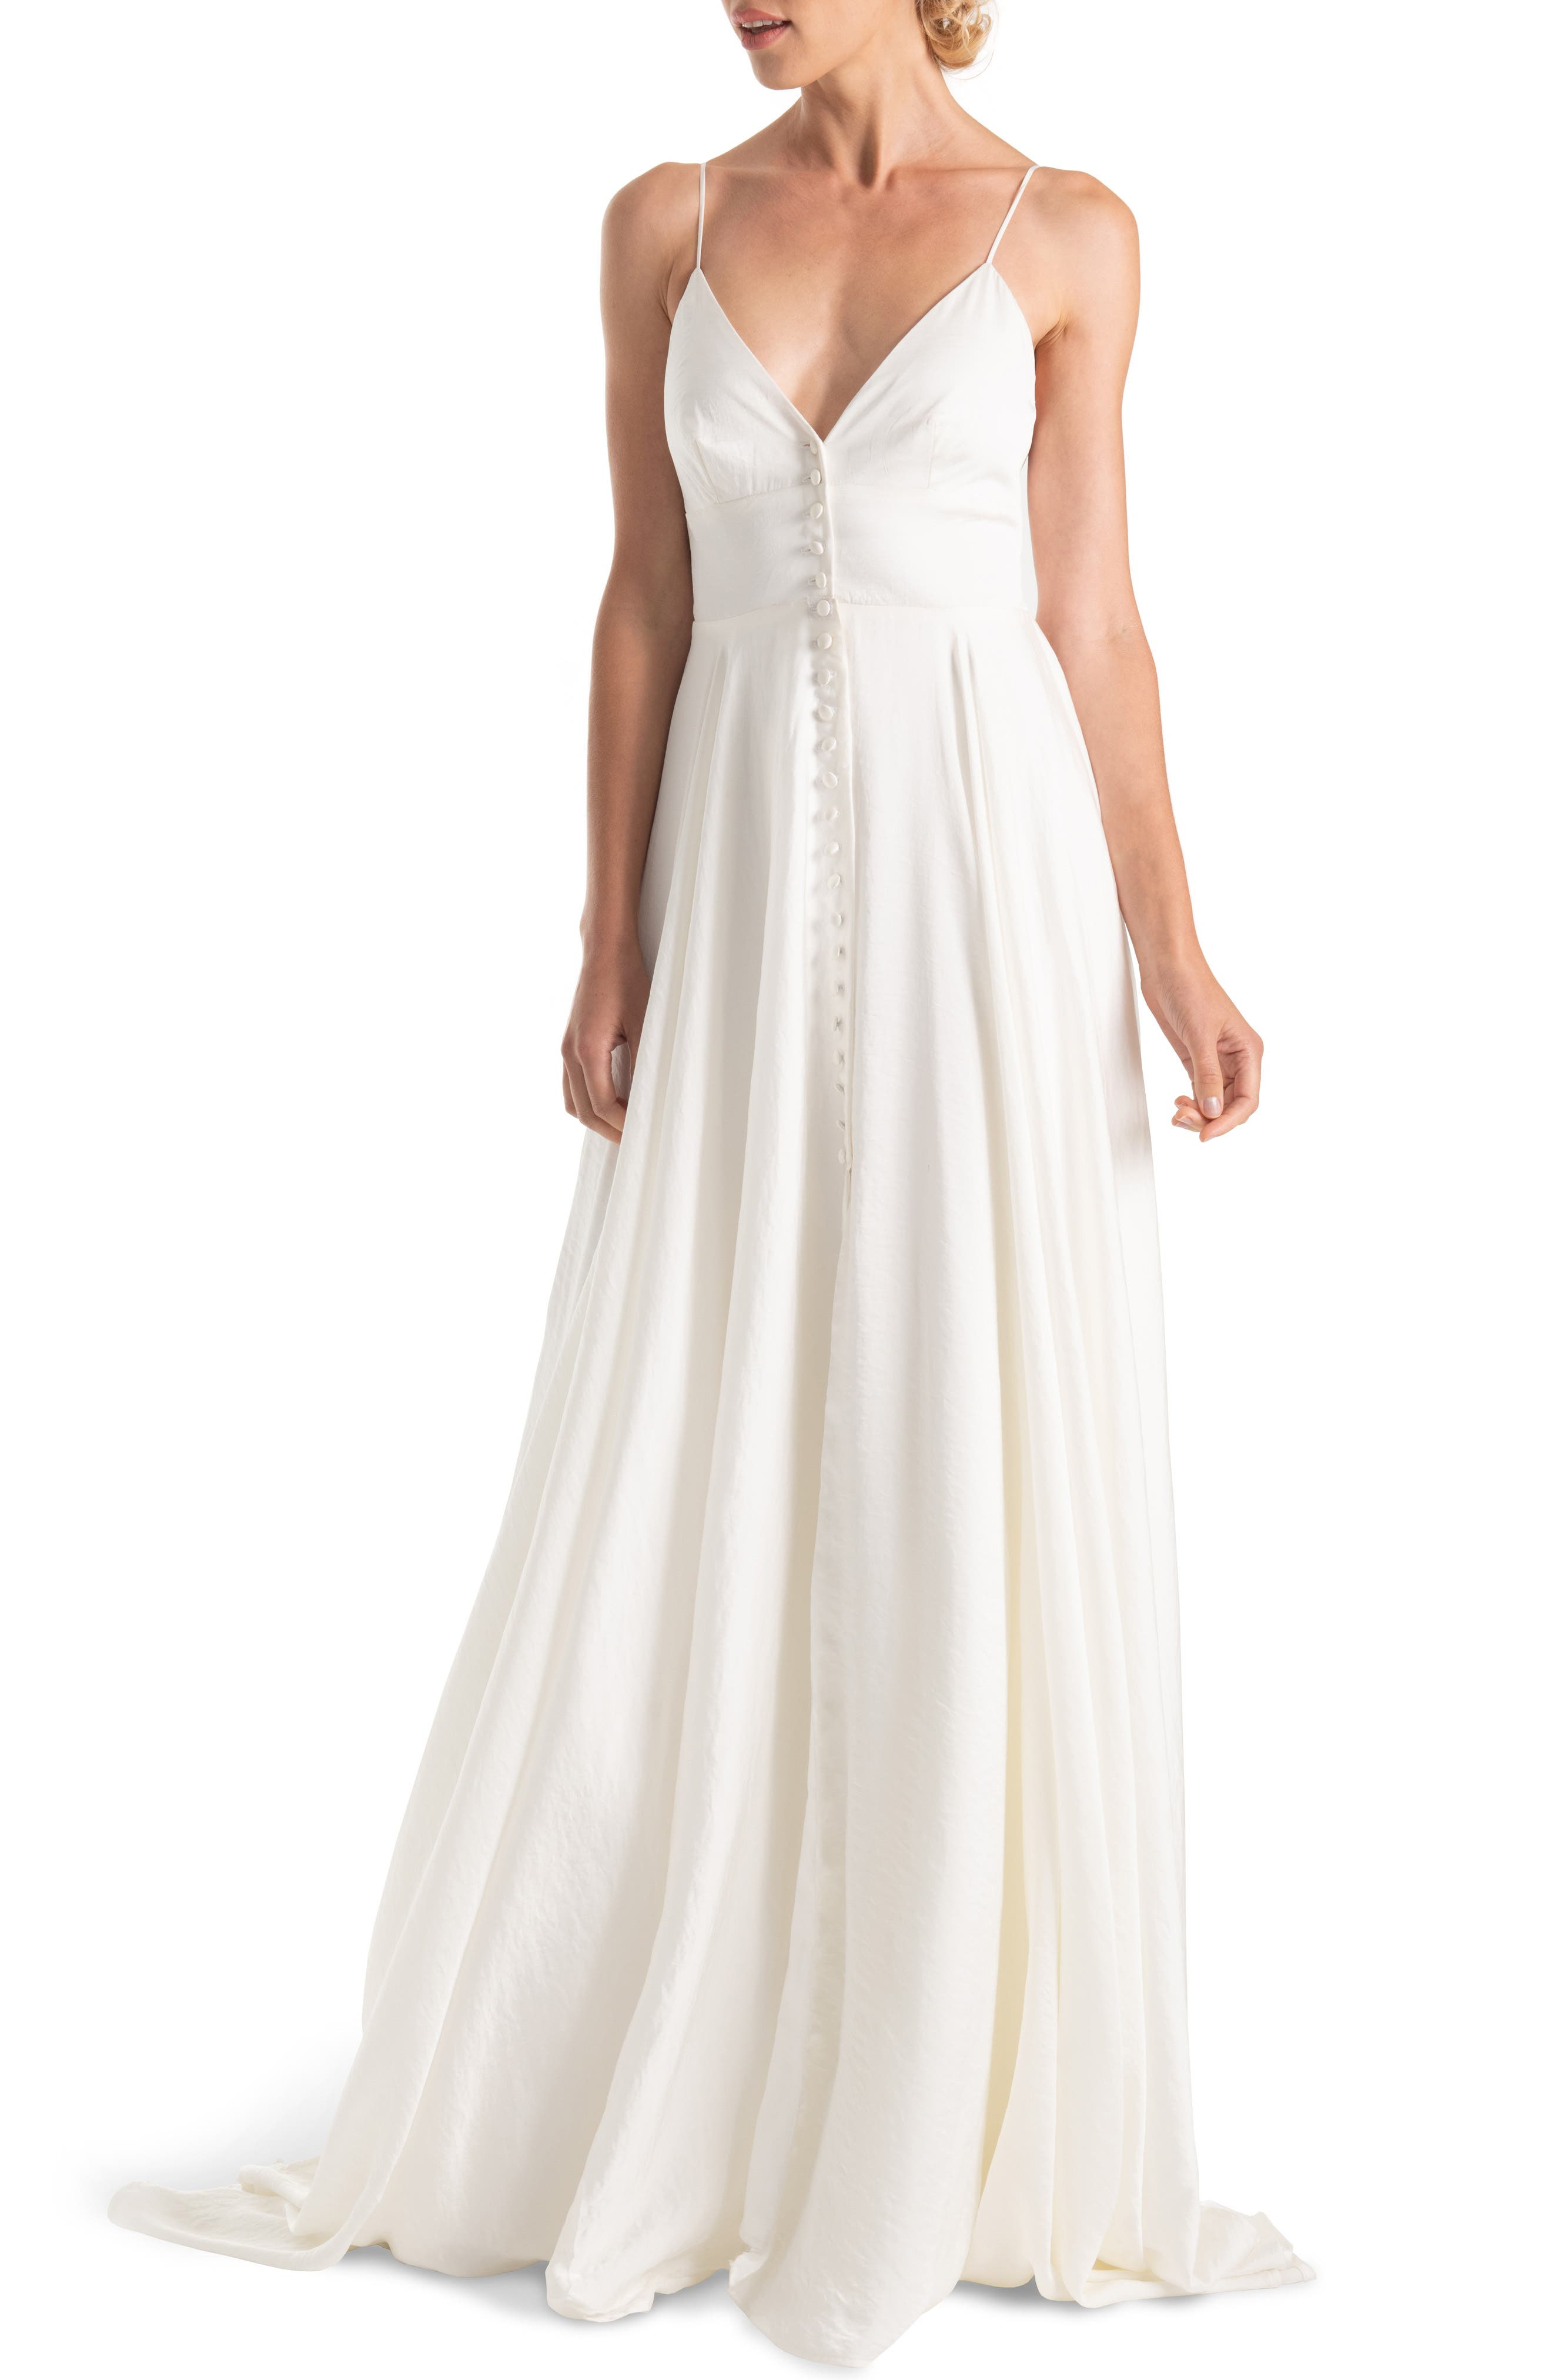 JOANNA AUGUST Joplin Slit Front A-Line Wedding Dress in White